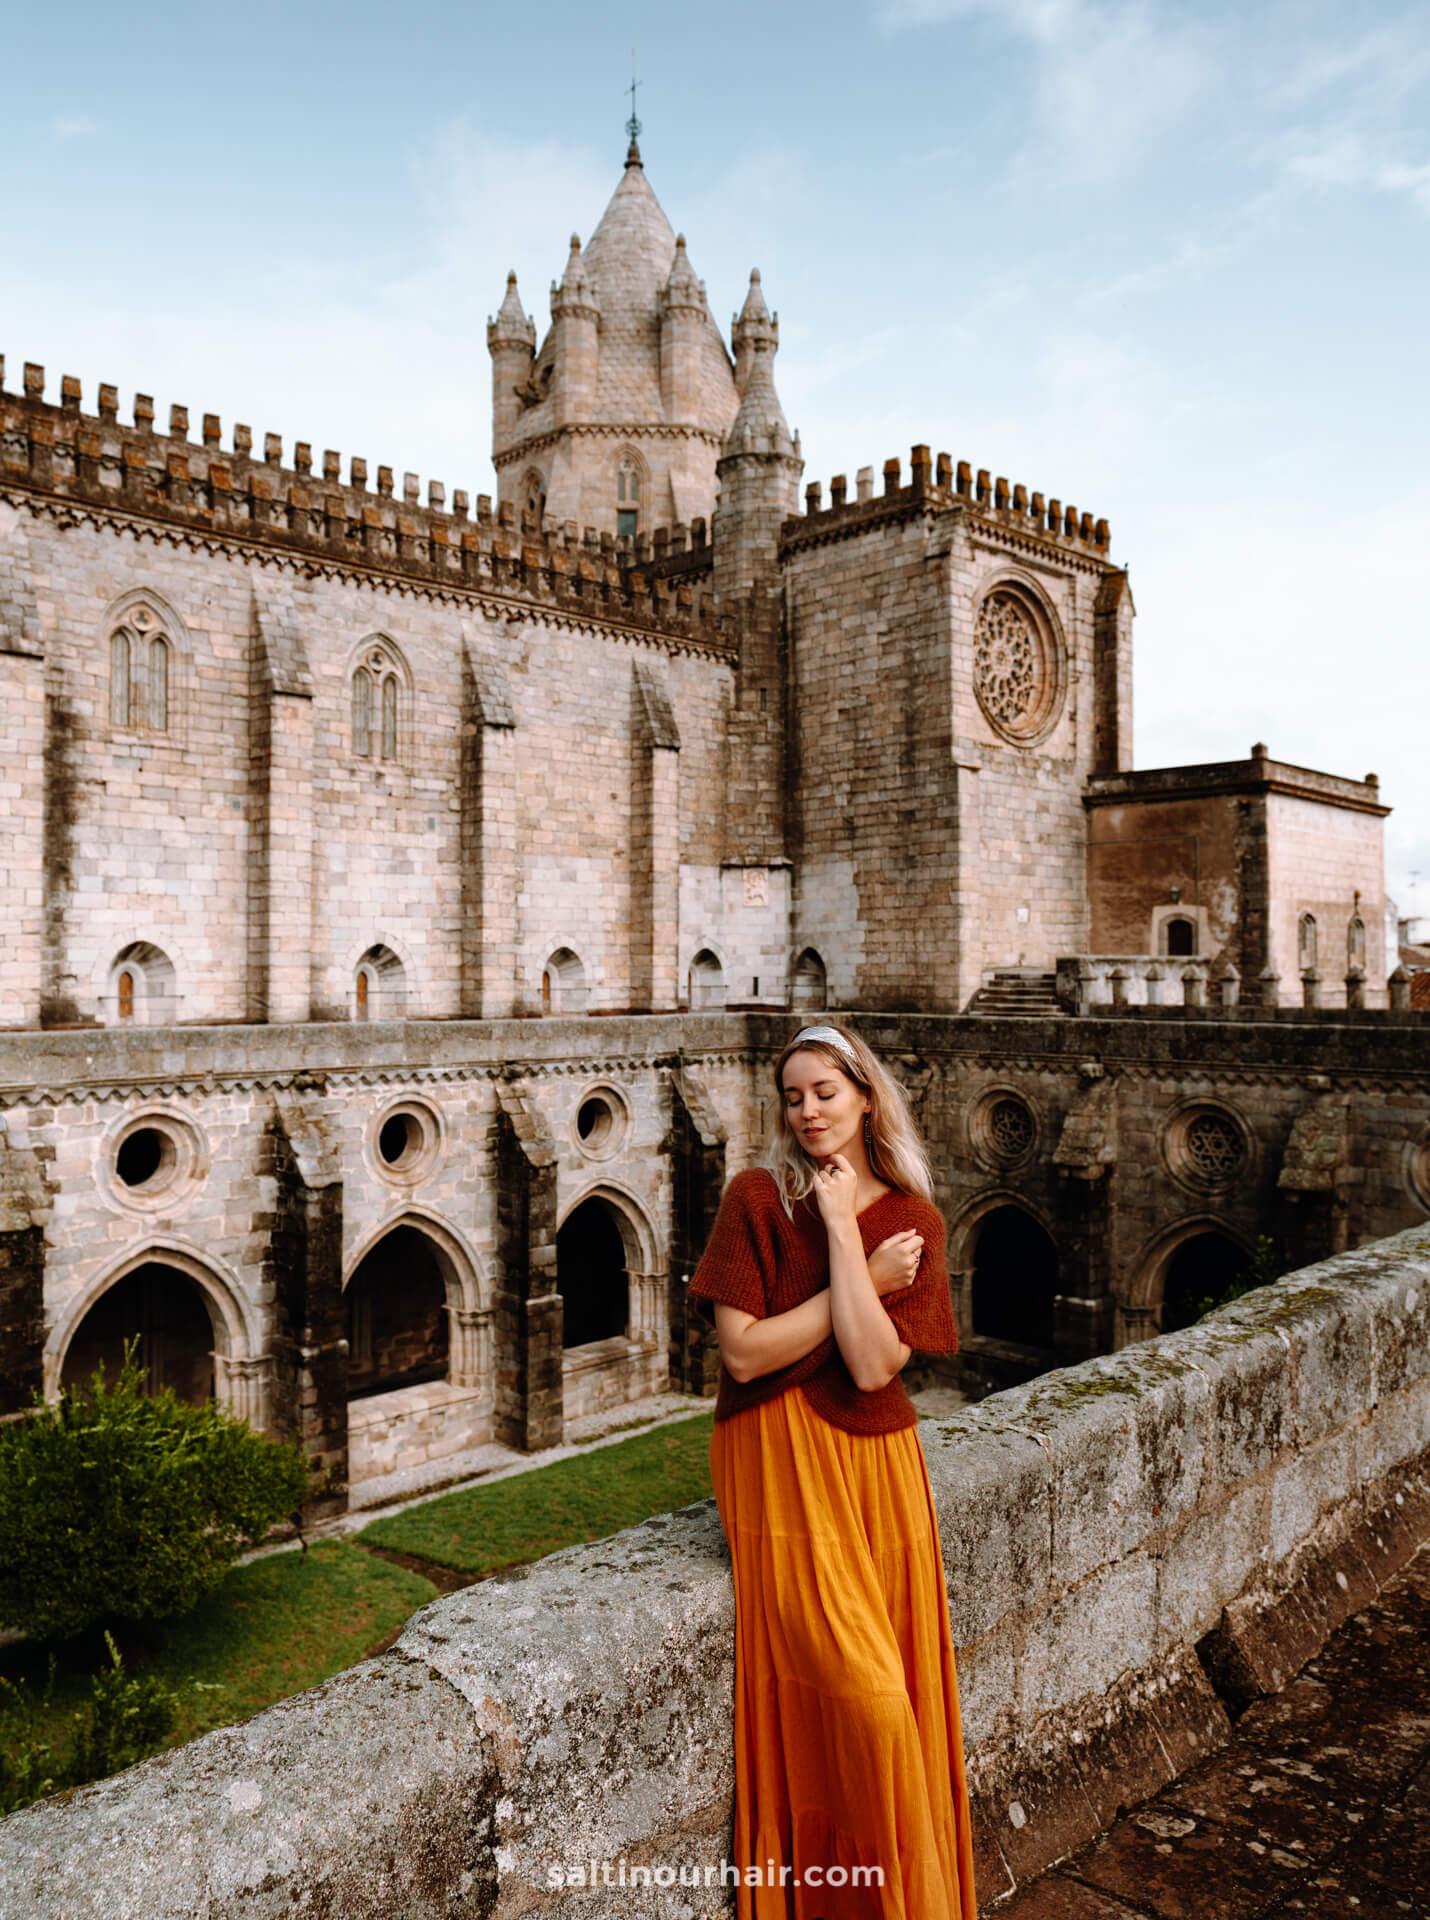 Kathedraal Evora Portugal